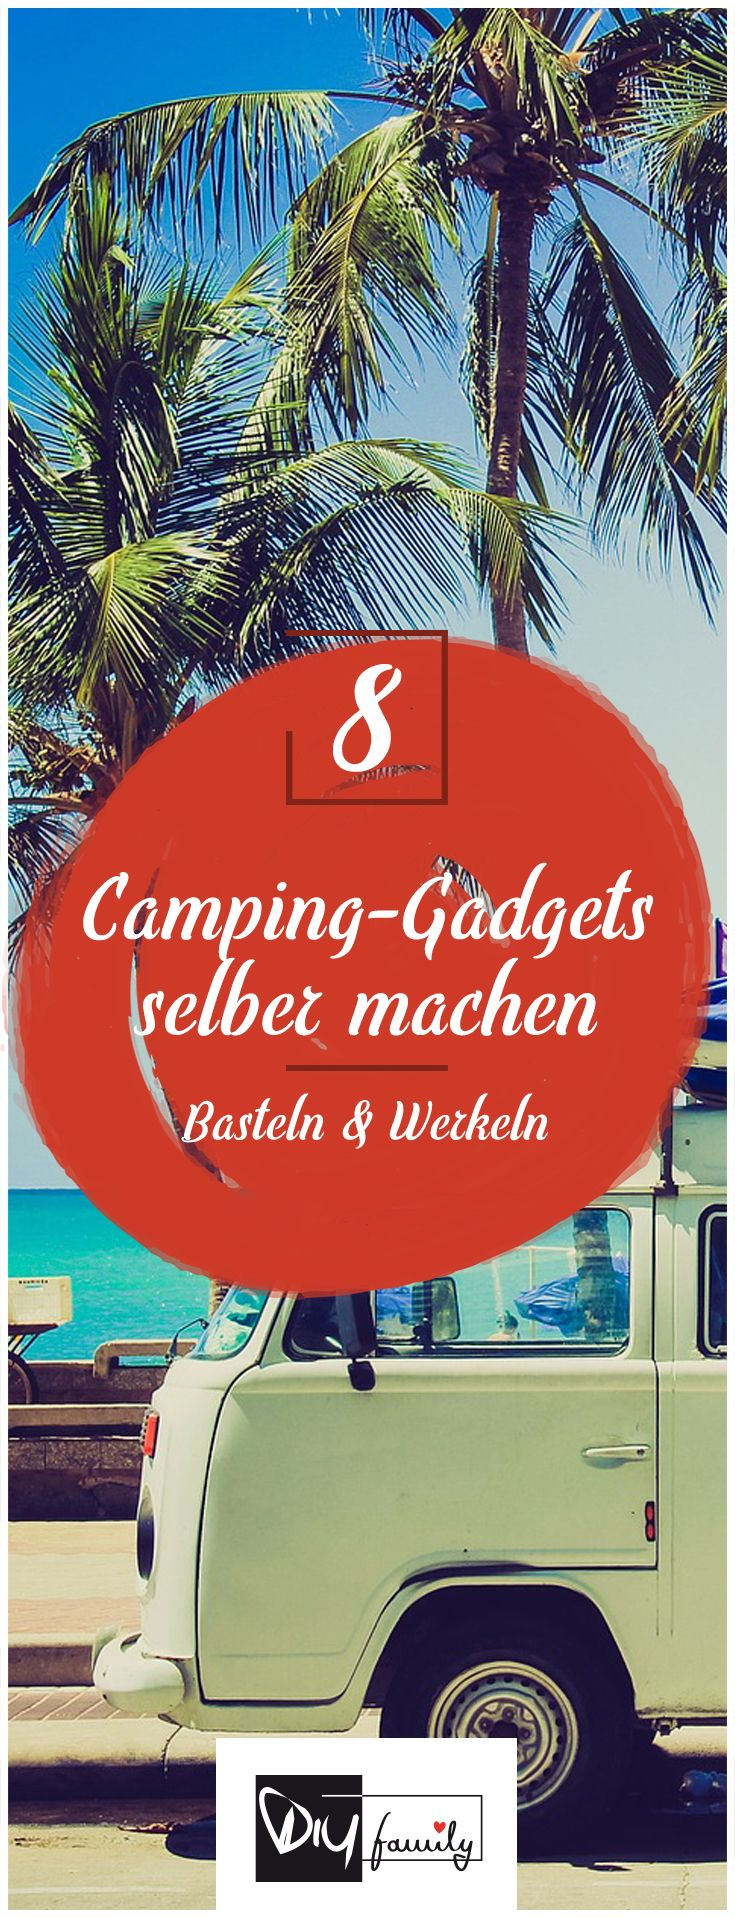 Camping-Gadgets selber machen - Die 8 besten Tools  #camping, #summer, #festival, #sunny,